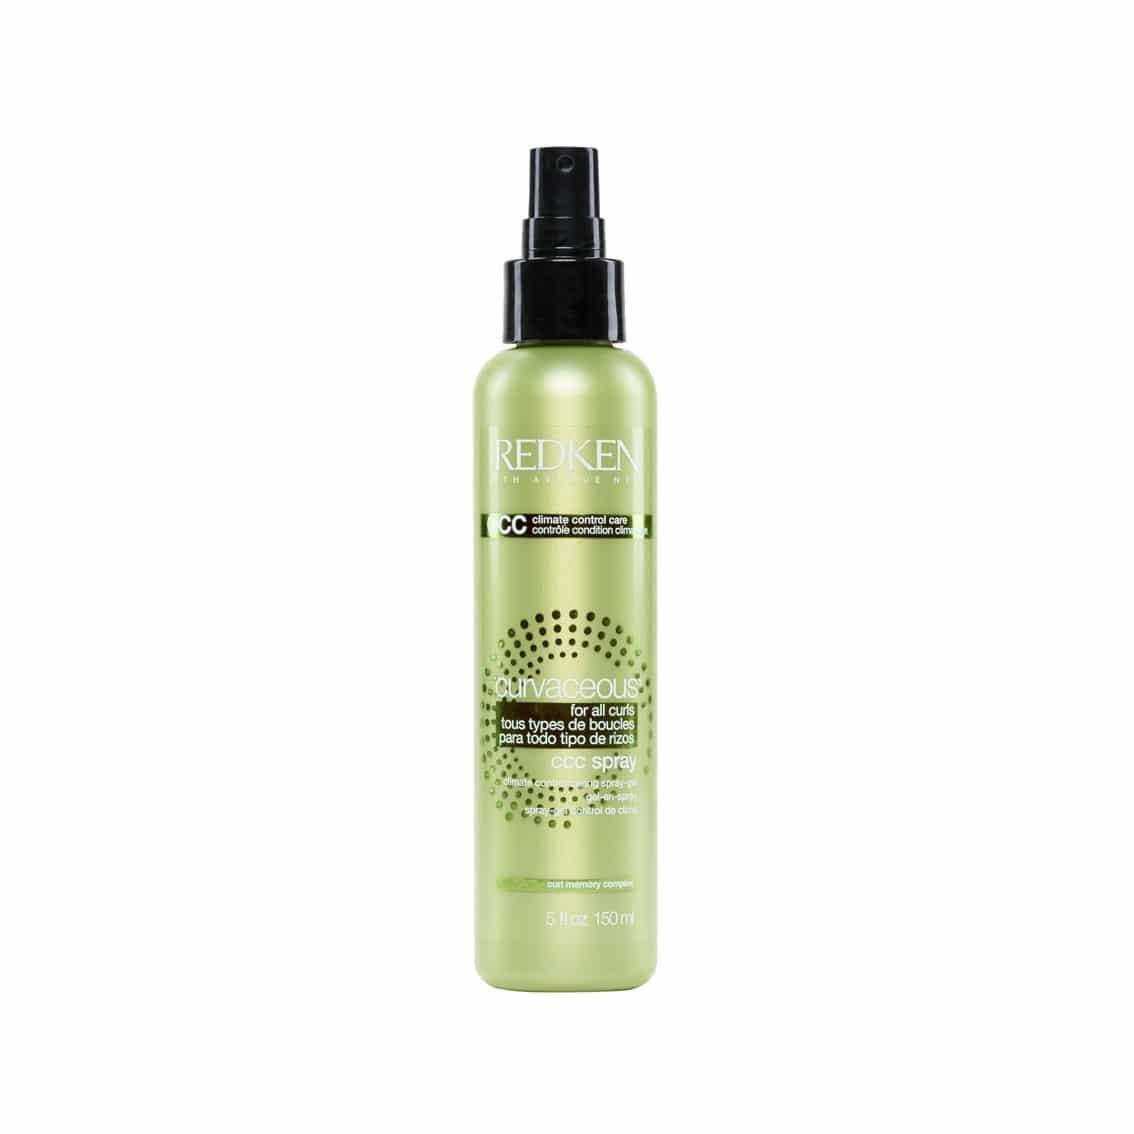 Curvaceous CCC Spray Gel 150 ml